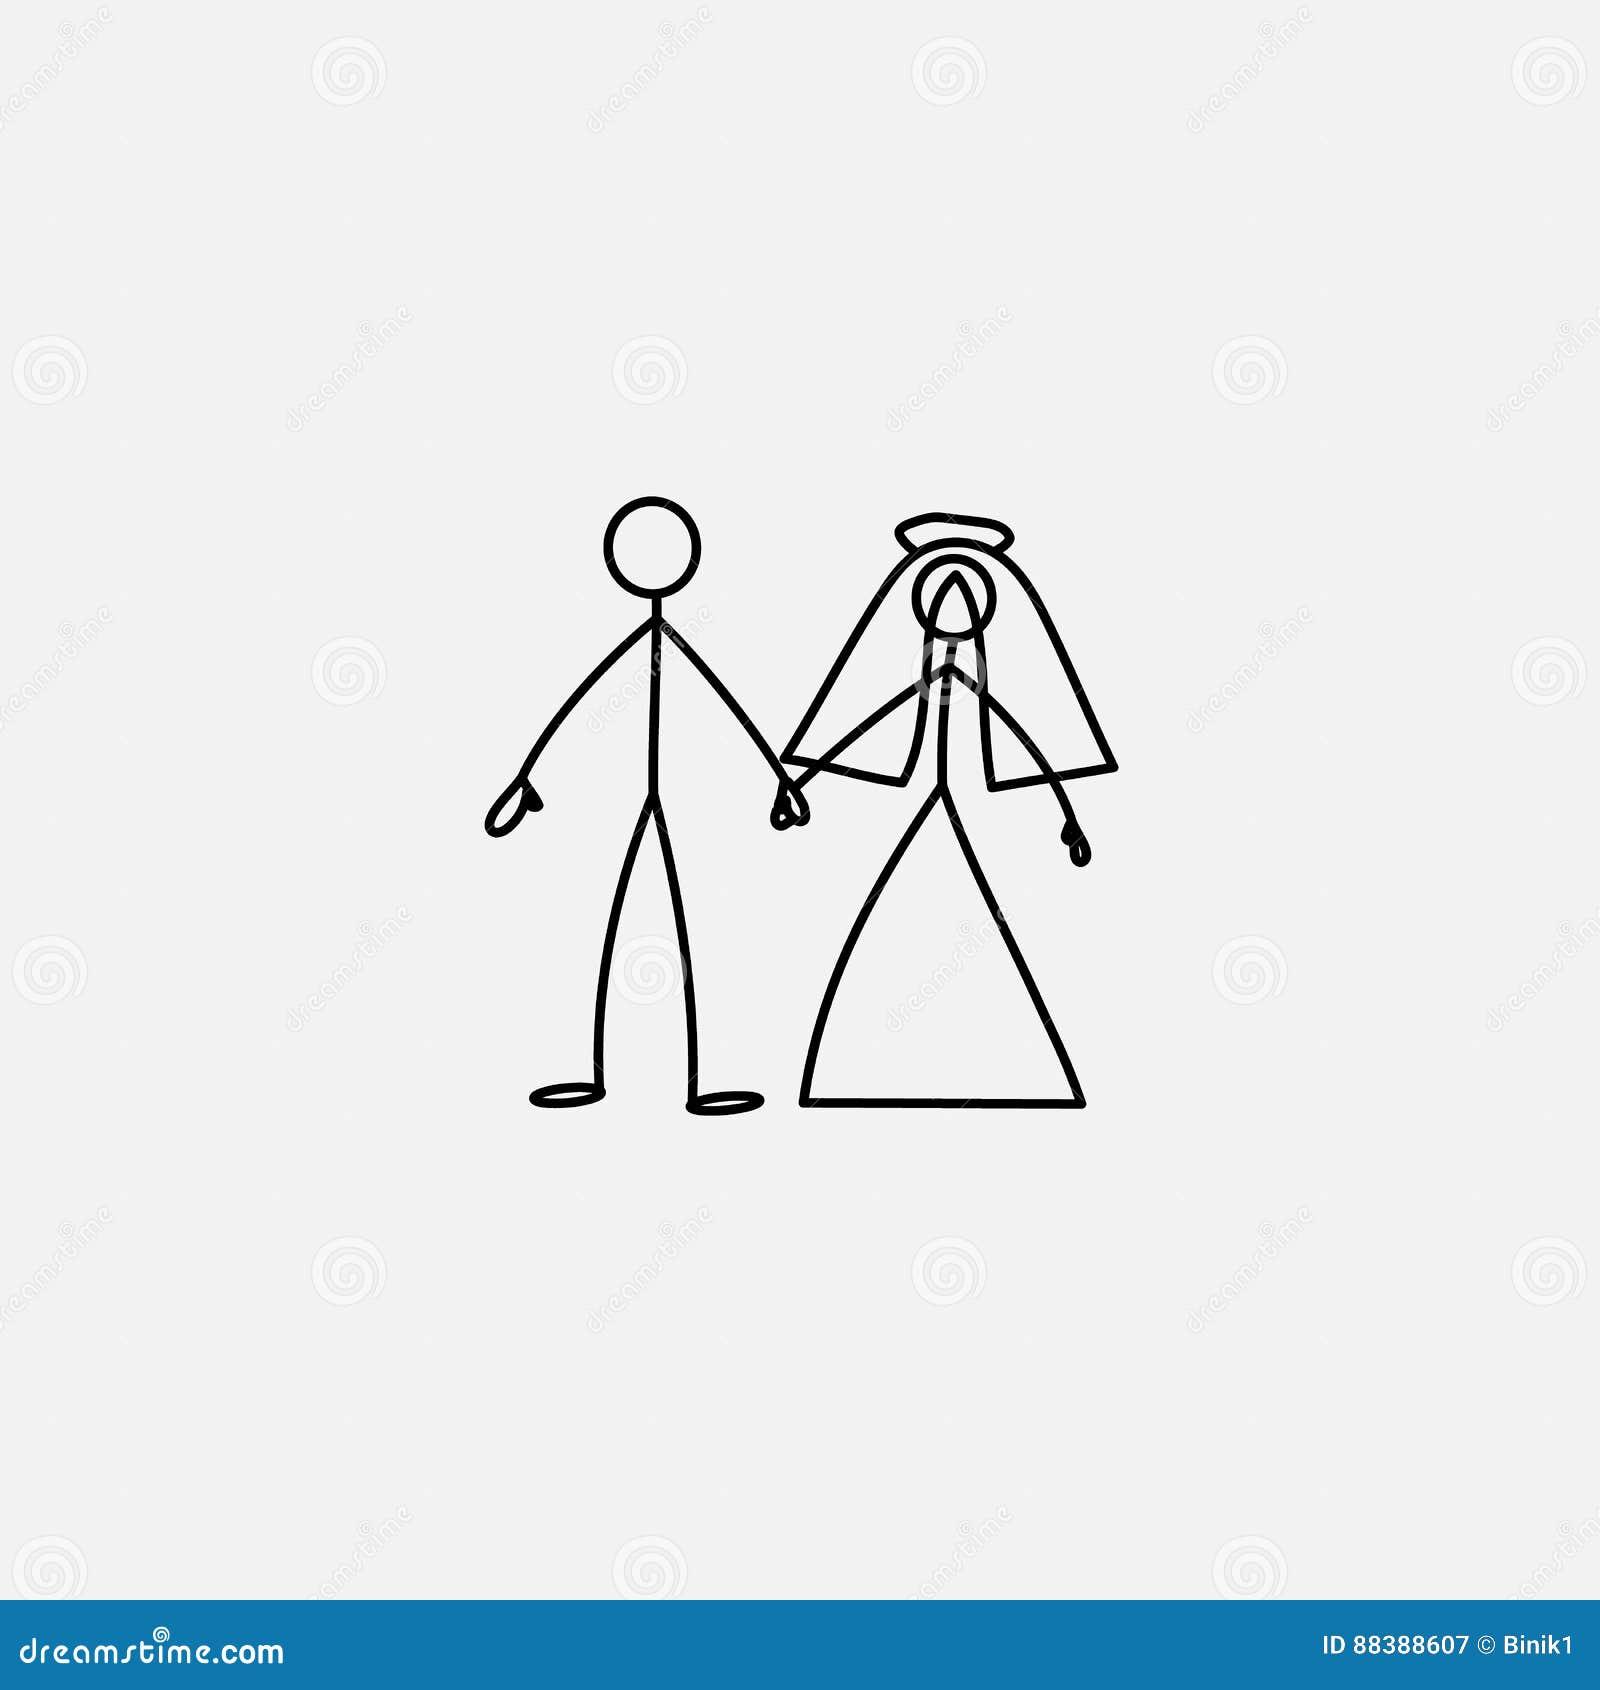 wedding family icon stick figure vector stock vector illustration